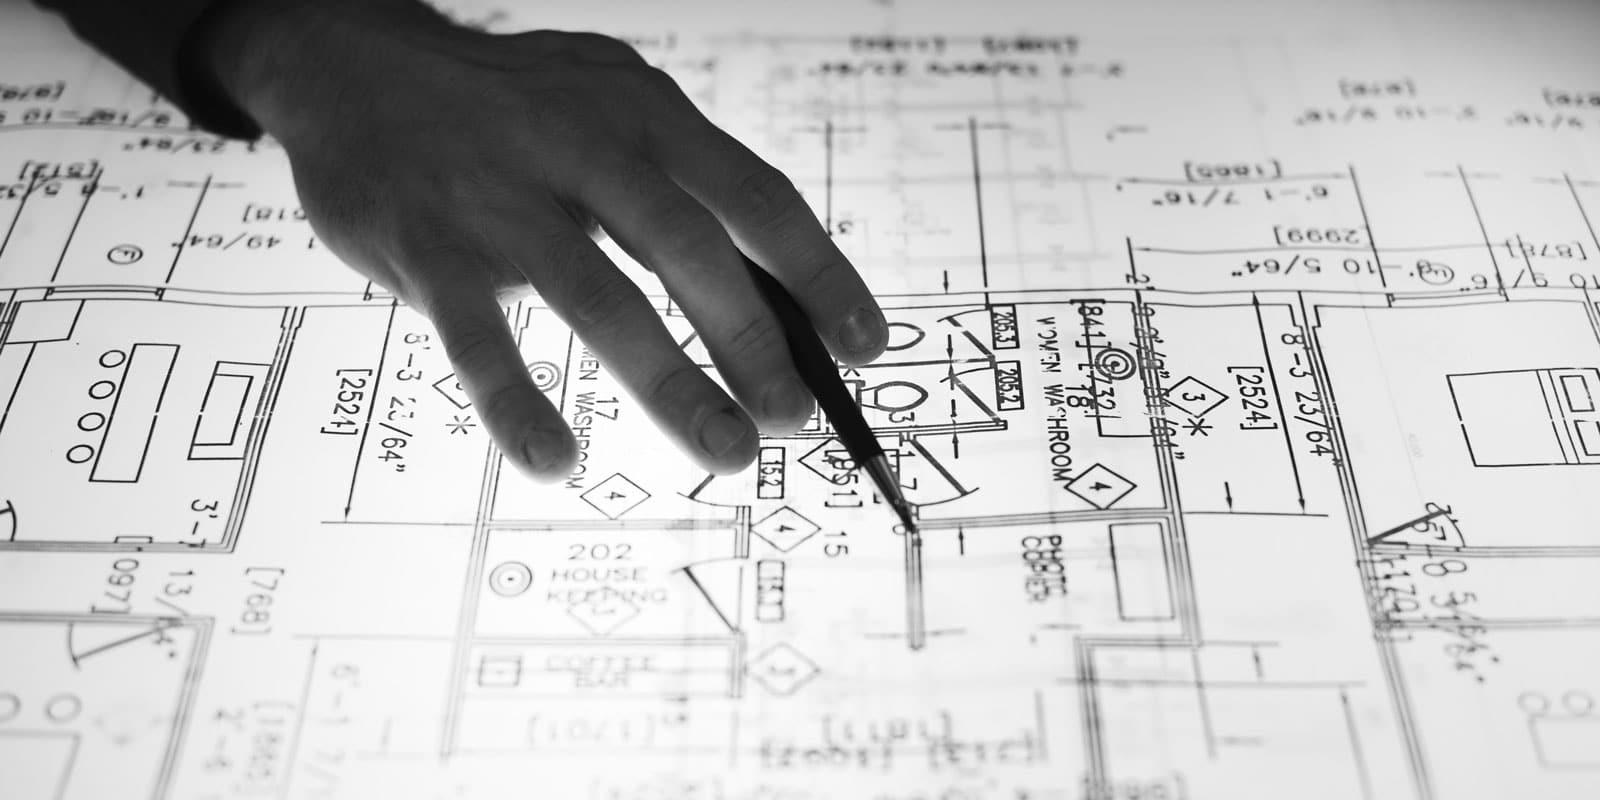 Construction company app development